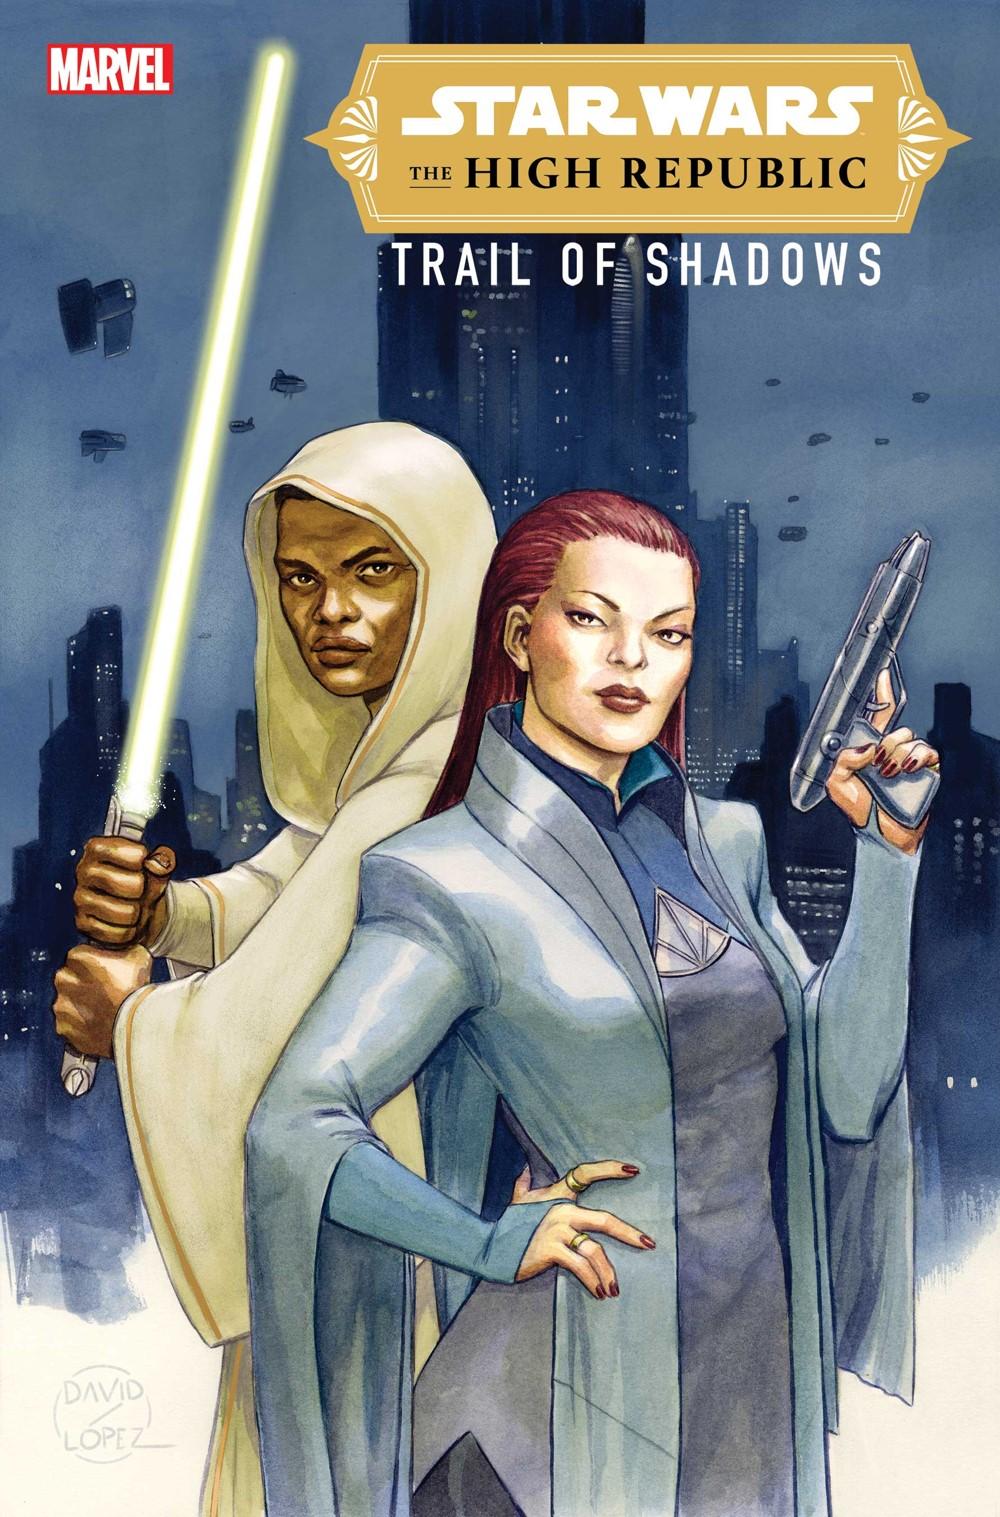 STWHIGHREPTOS2021001_COV Marvel Comics October 2021 Solicitations